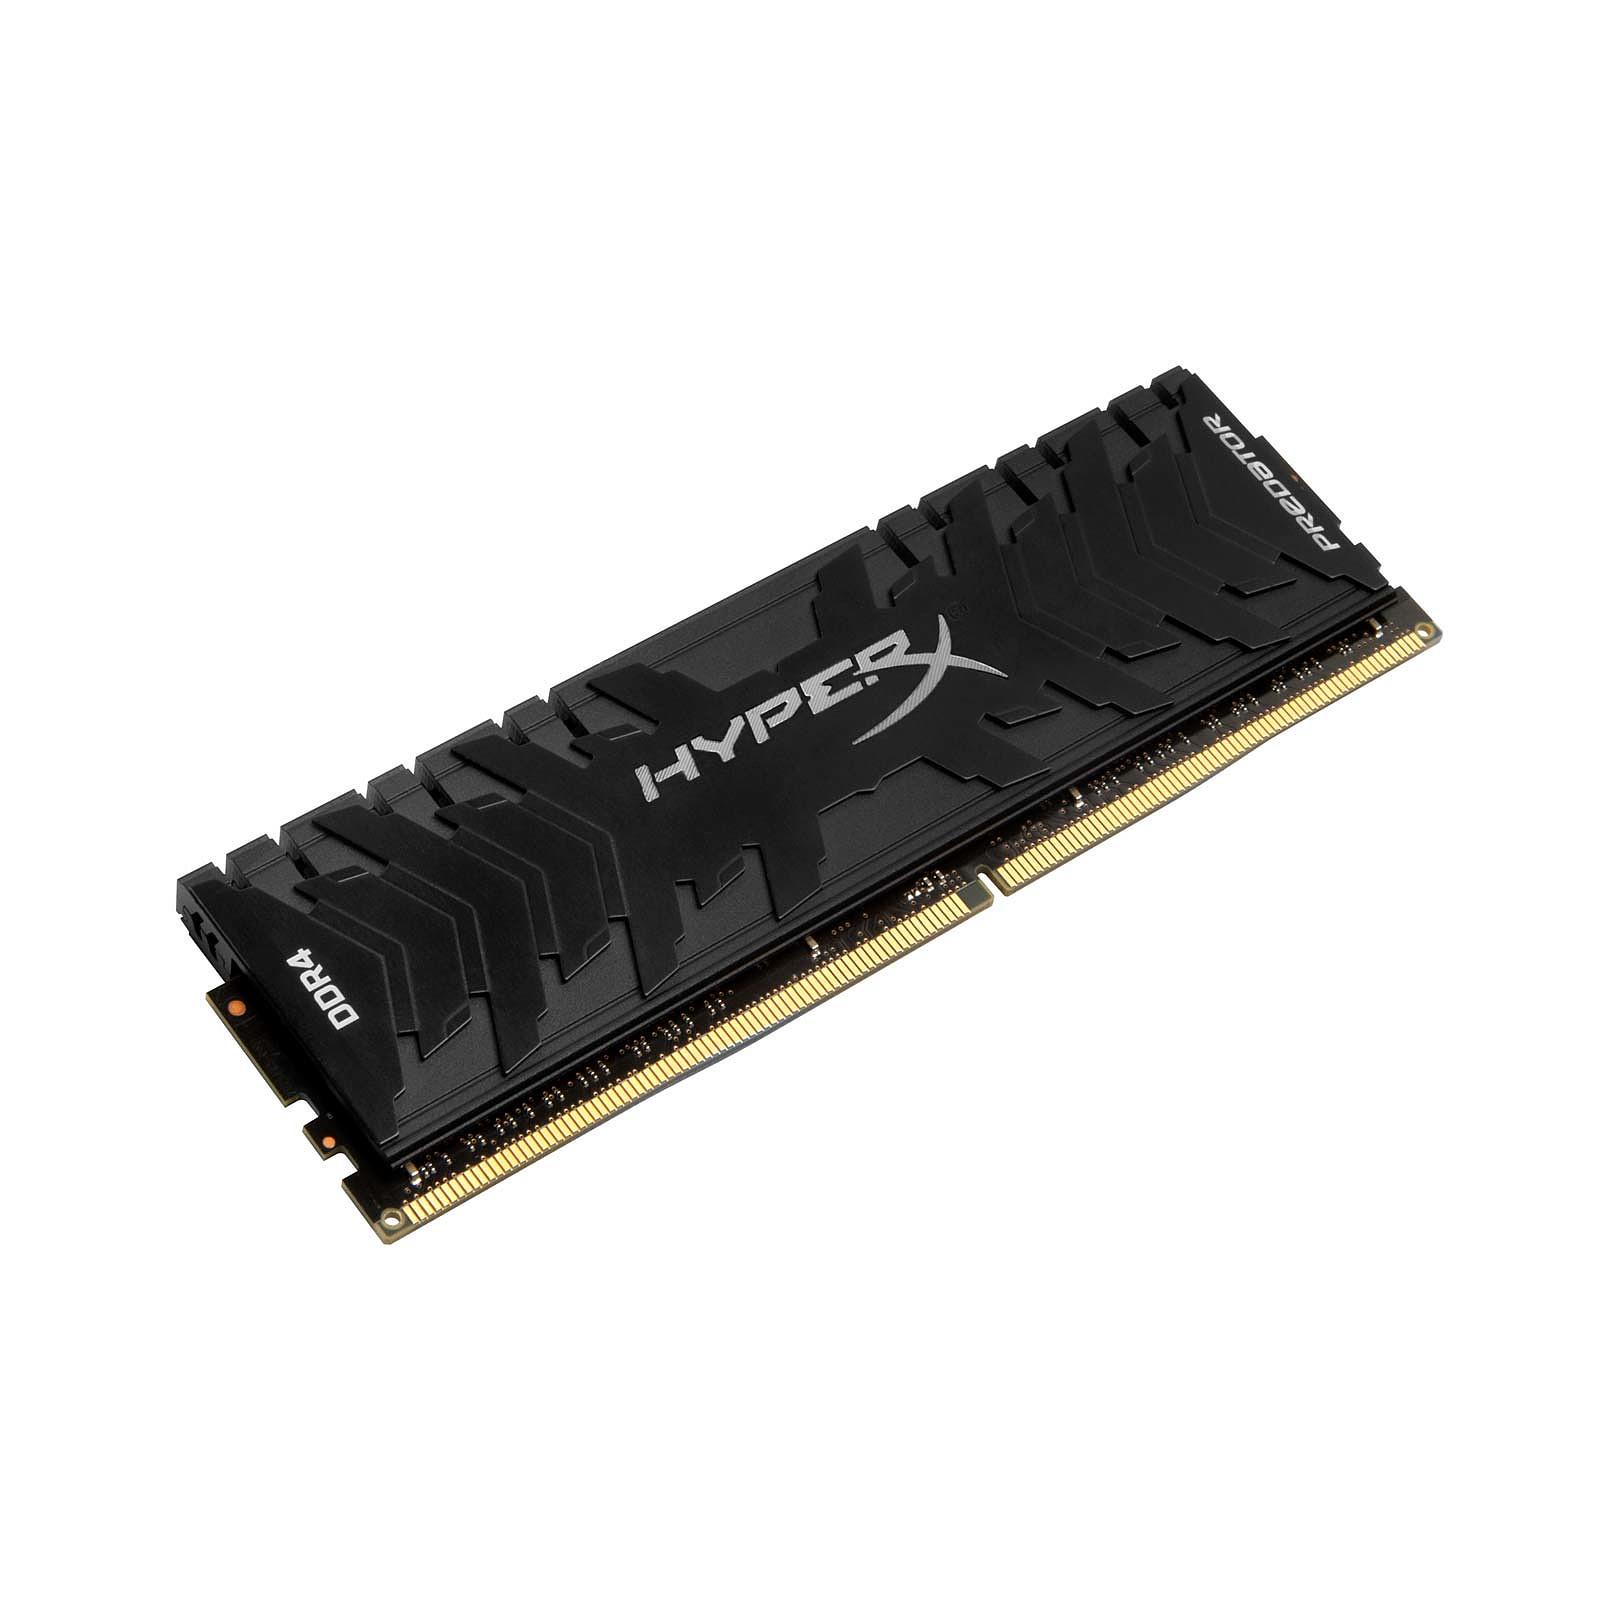 HyperX Predator Noir 16 Go DDR4 3600 MHz CL17